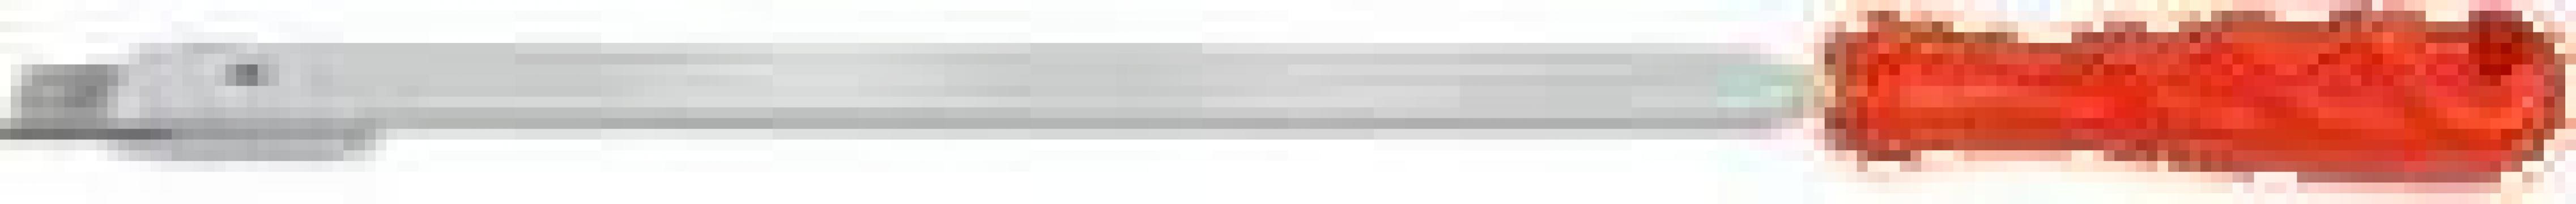 Daltita plata cu placuta amovibila HM 7532-016 de la Nascom Invest